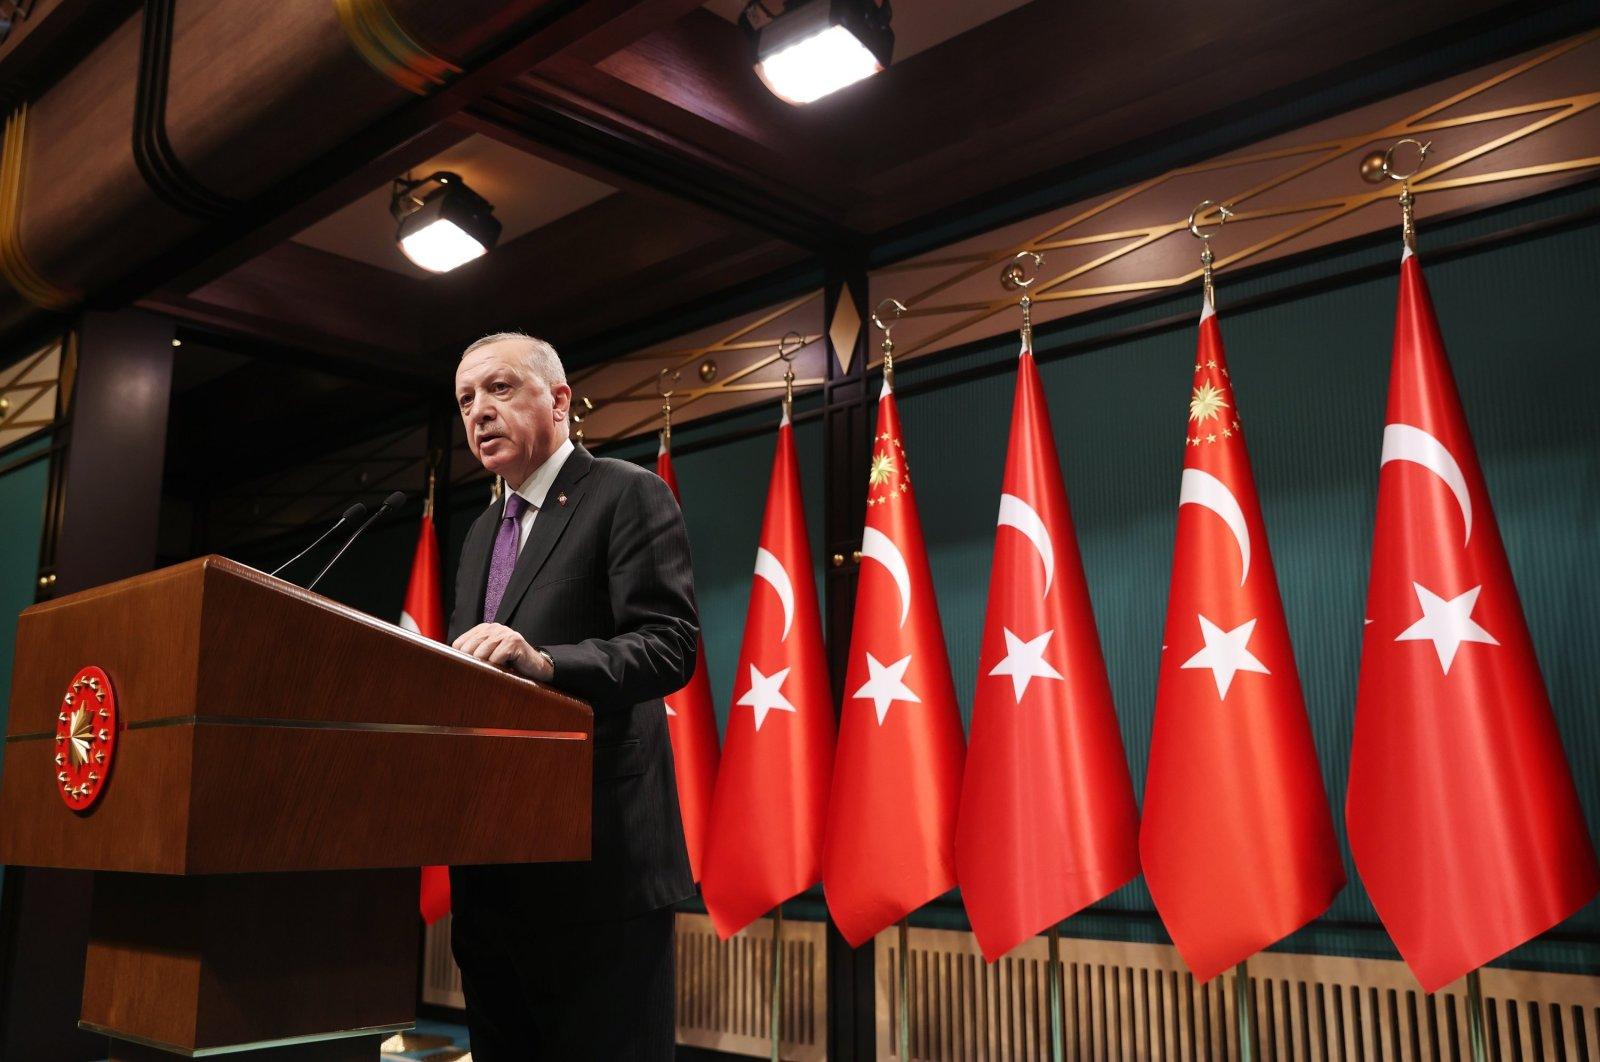 President Recep Tayyip Erdoğan gives a speech at the Presidential Complex in Ankara, Turkey, Feb. 1, 2021 (AA File Photo)